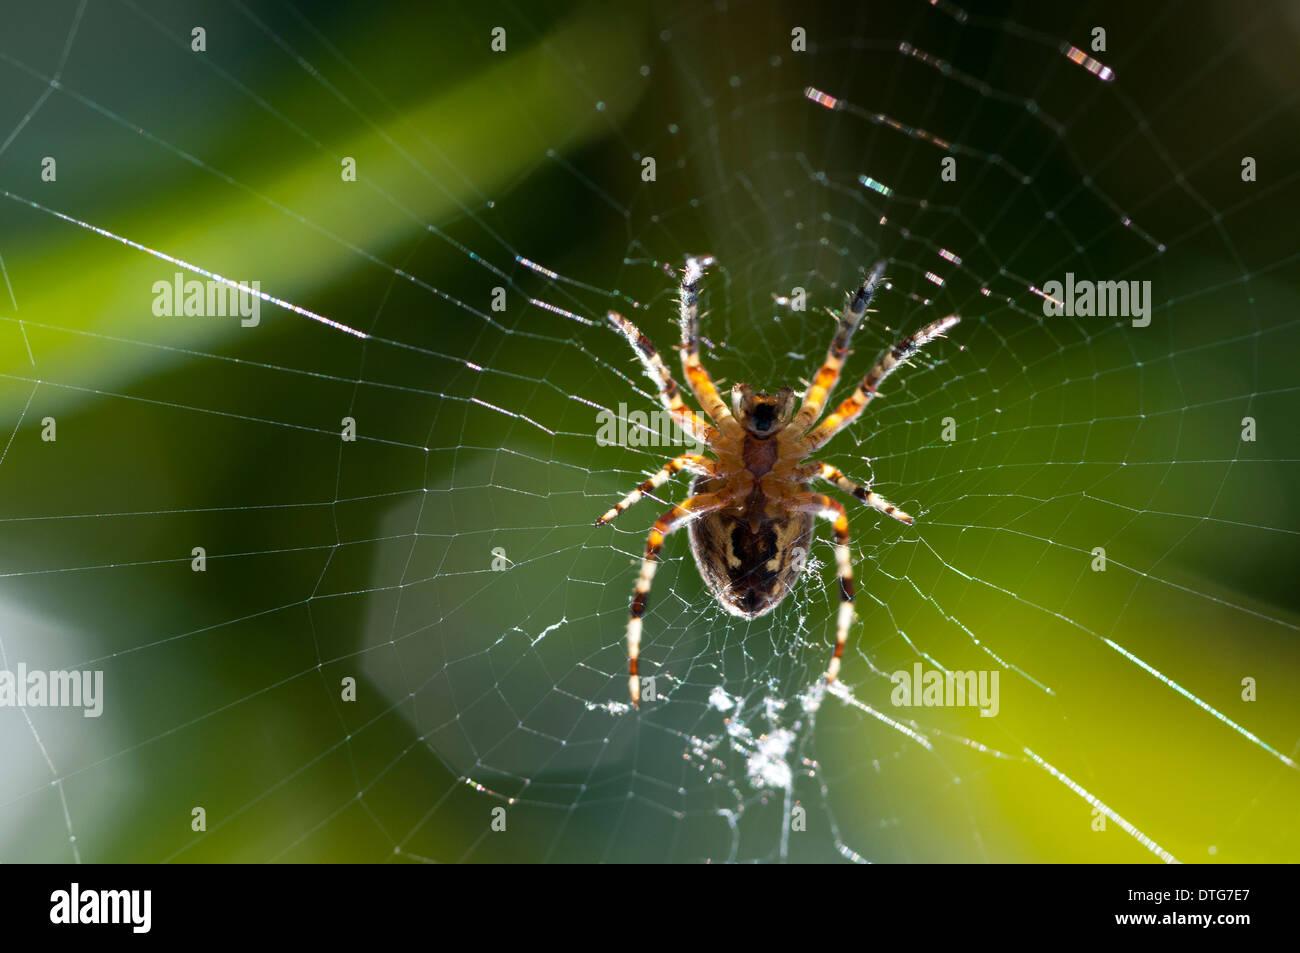 Orb-Weaving Spider (Araneus diadematus) on his web with morning dew. - Stock Image